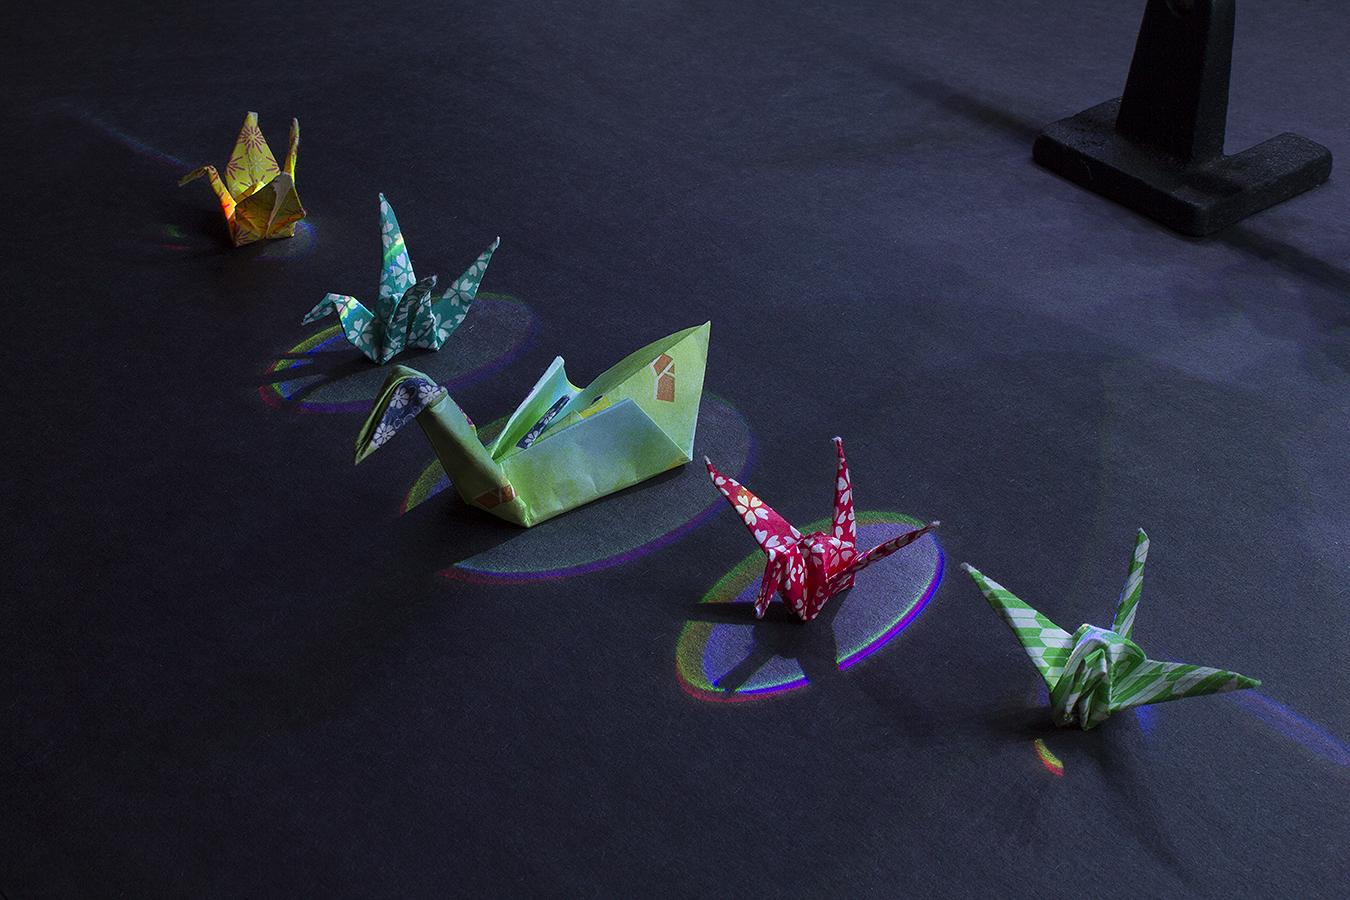 4_Row_Jonathan_Tang_UPenn_Tony_Ward_Studio_Long_Exposure_Low_Light_LED_Optics_Origami_Paper_Spotlight